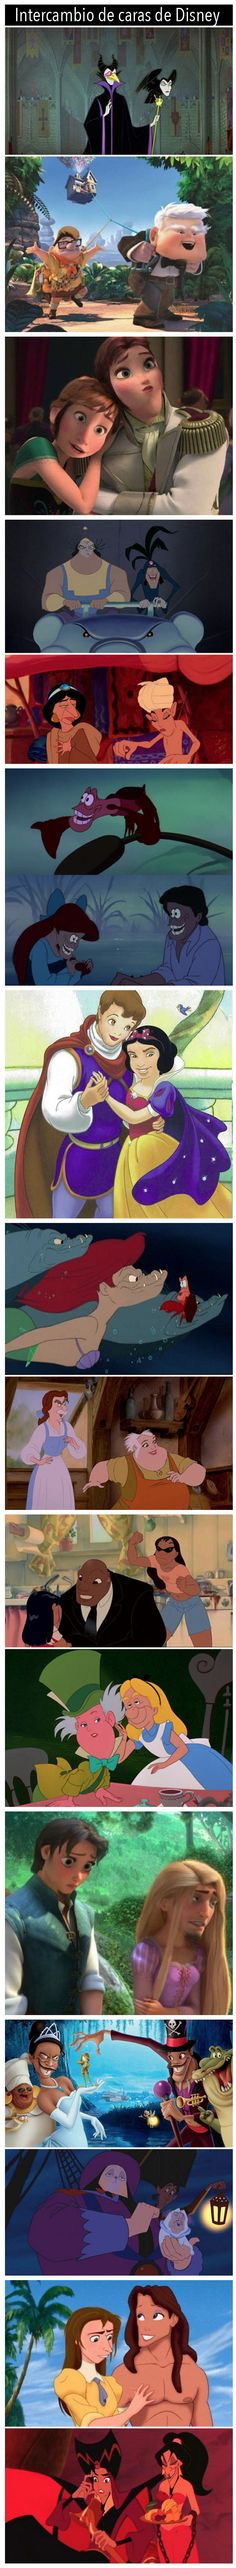 Intercambio de caras de Disney.